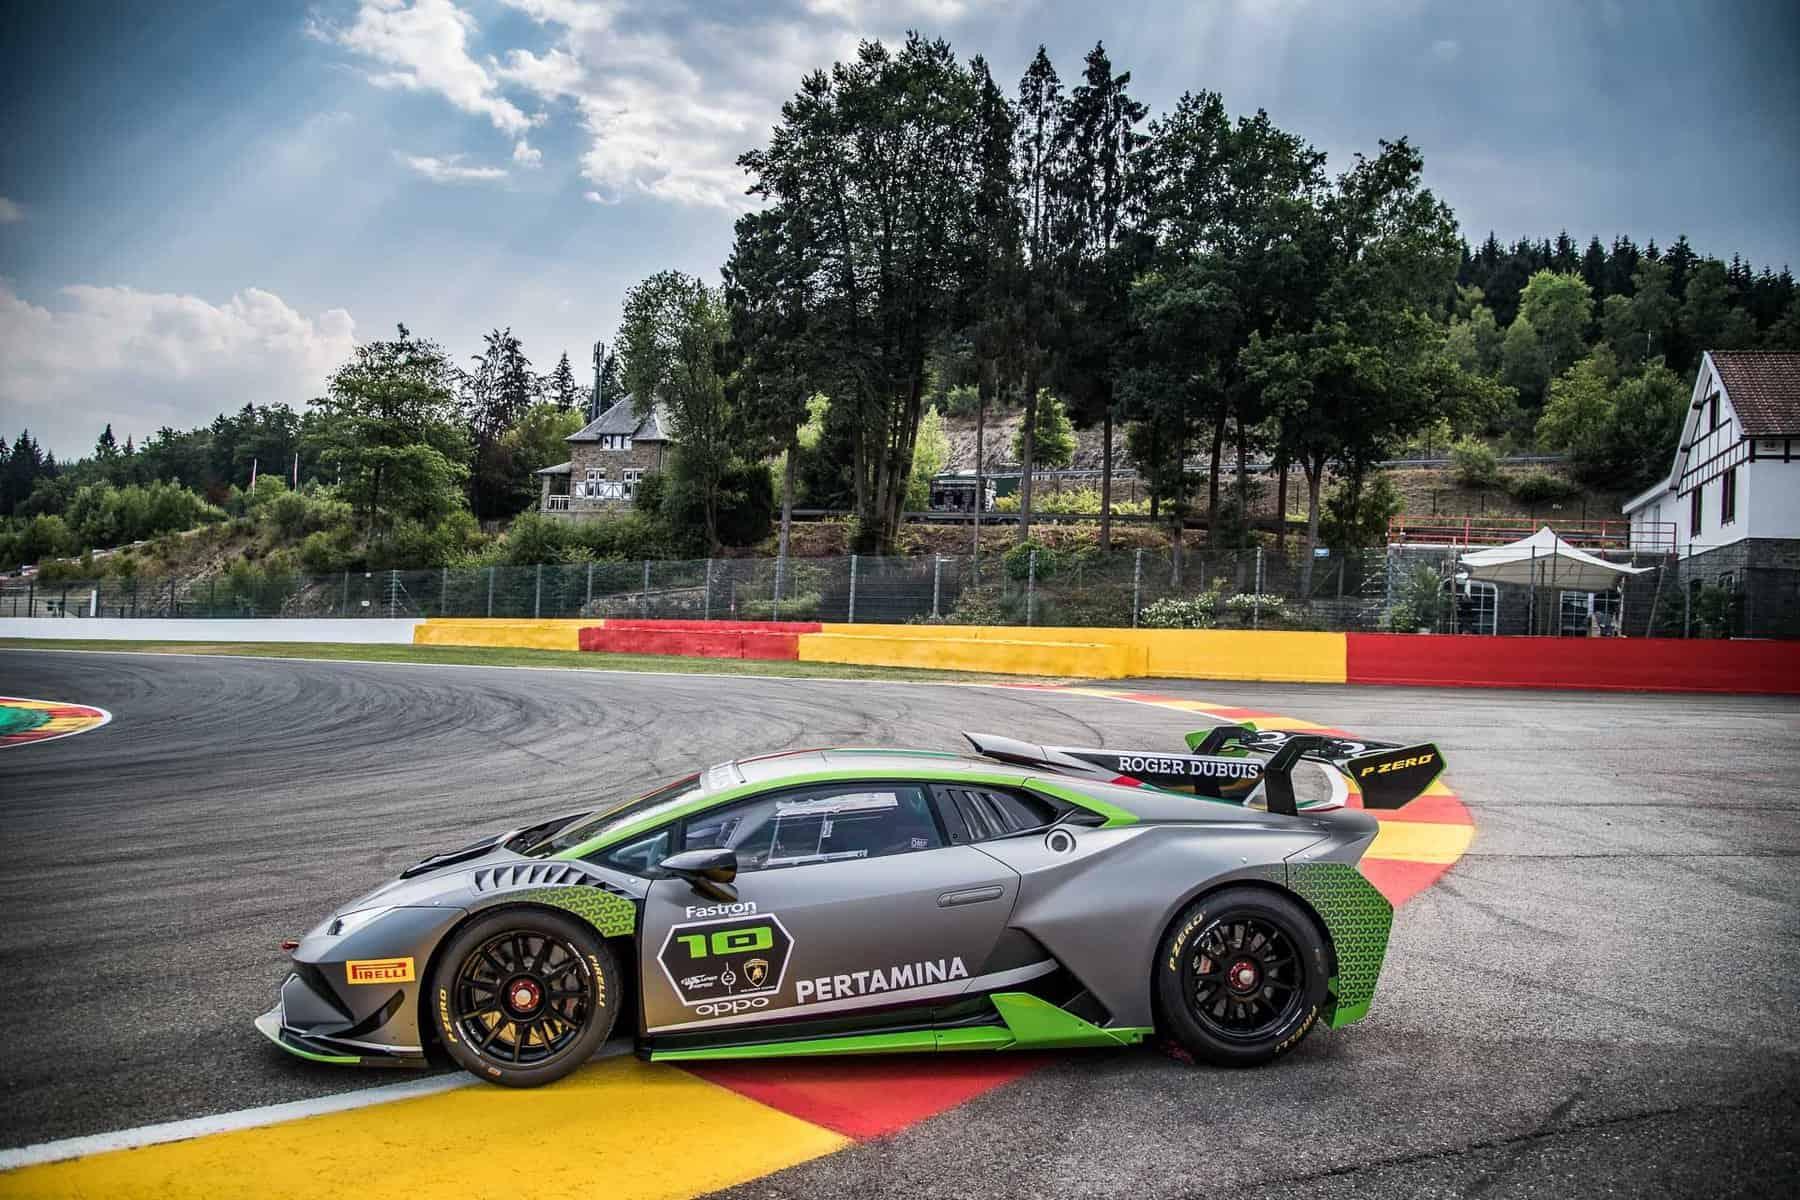 Lamborghini Huracan Super Trofeo Evo 10th Edition